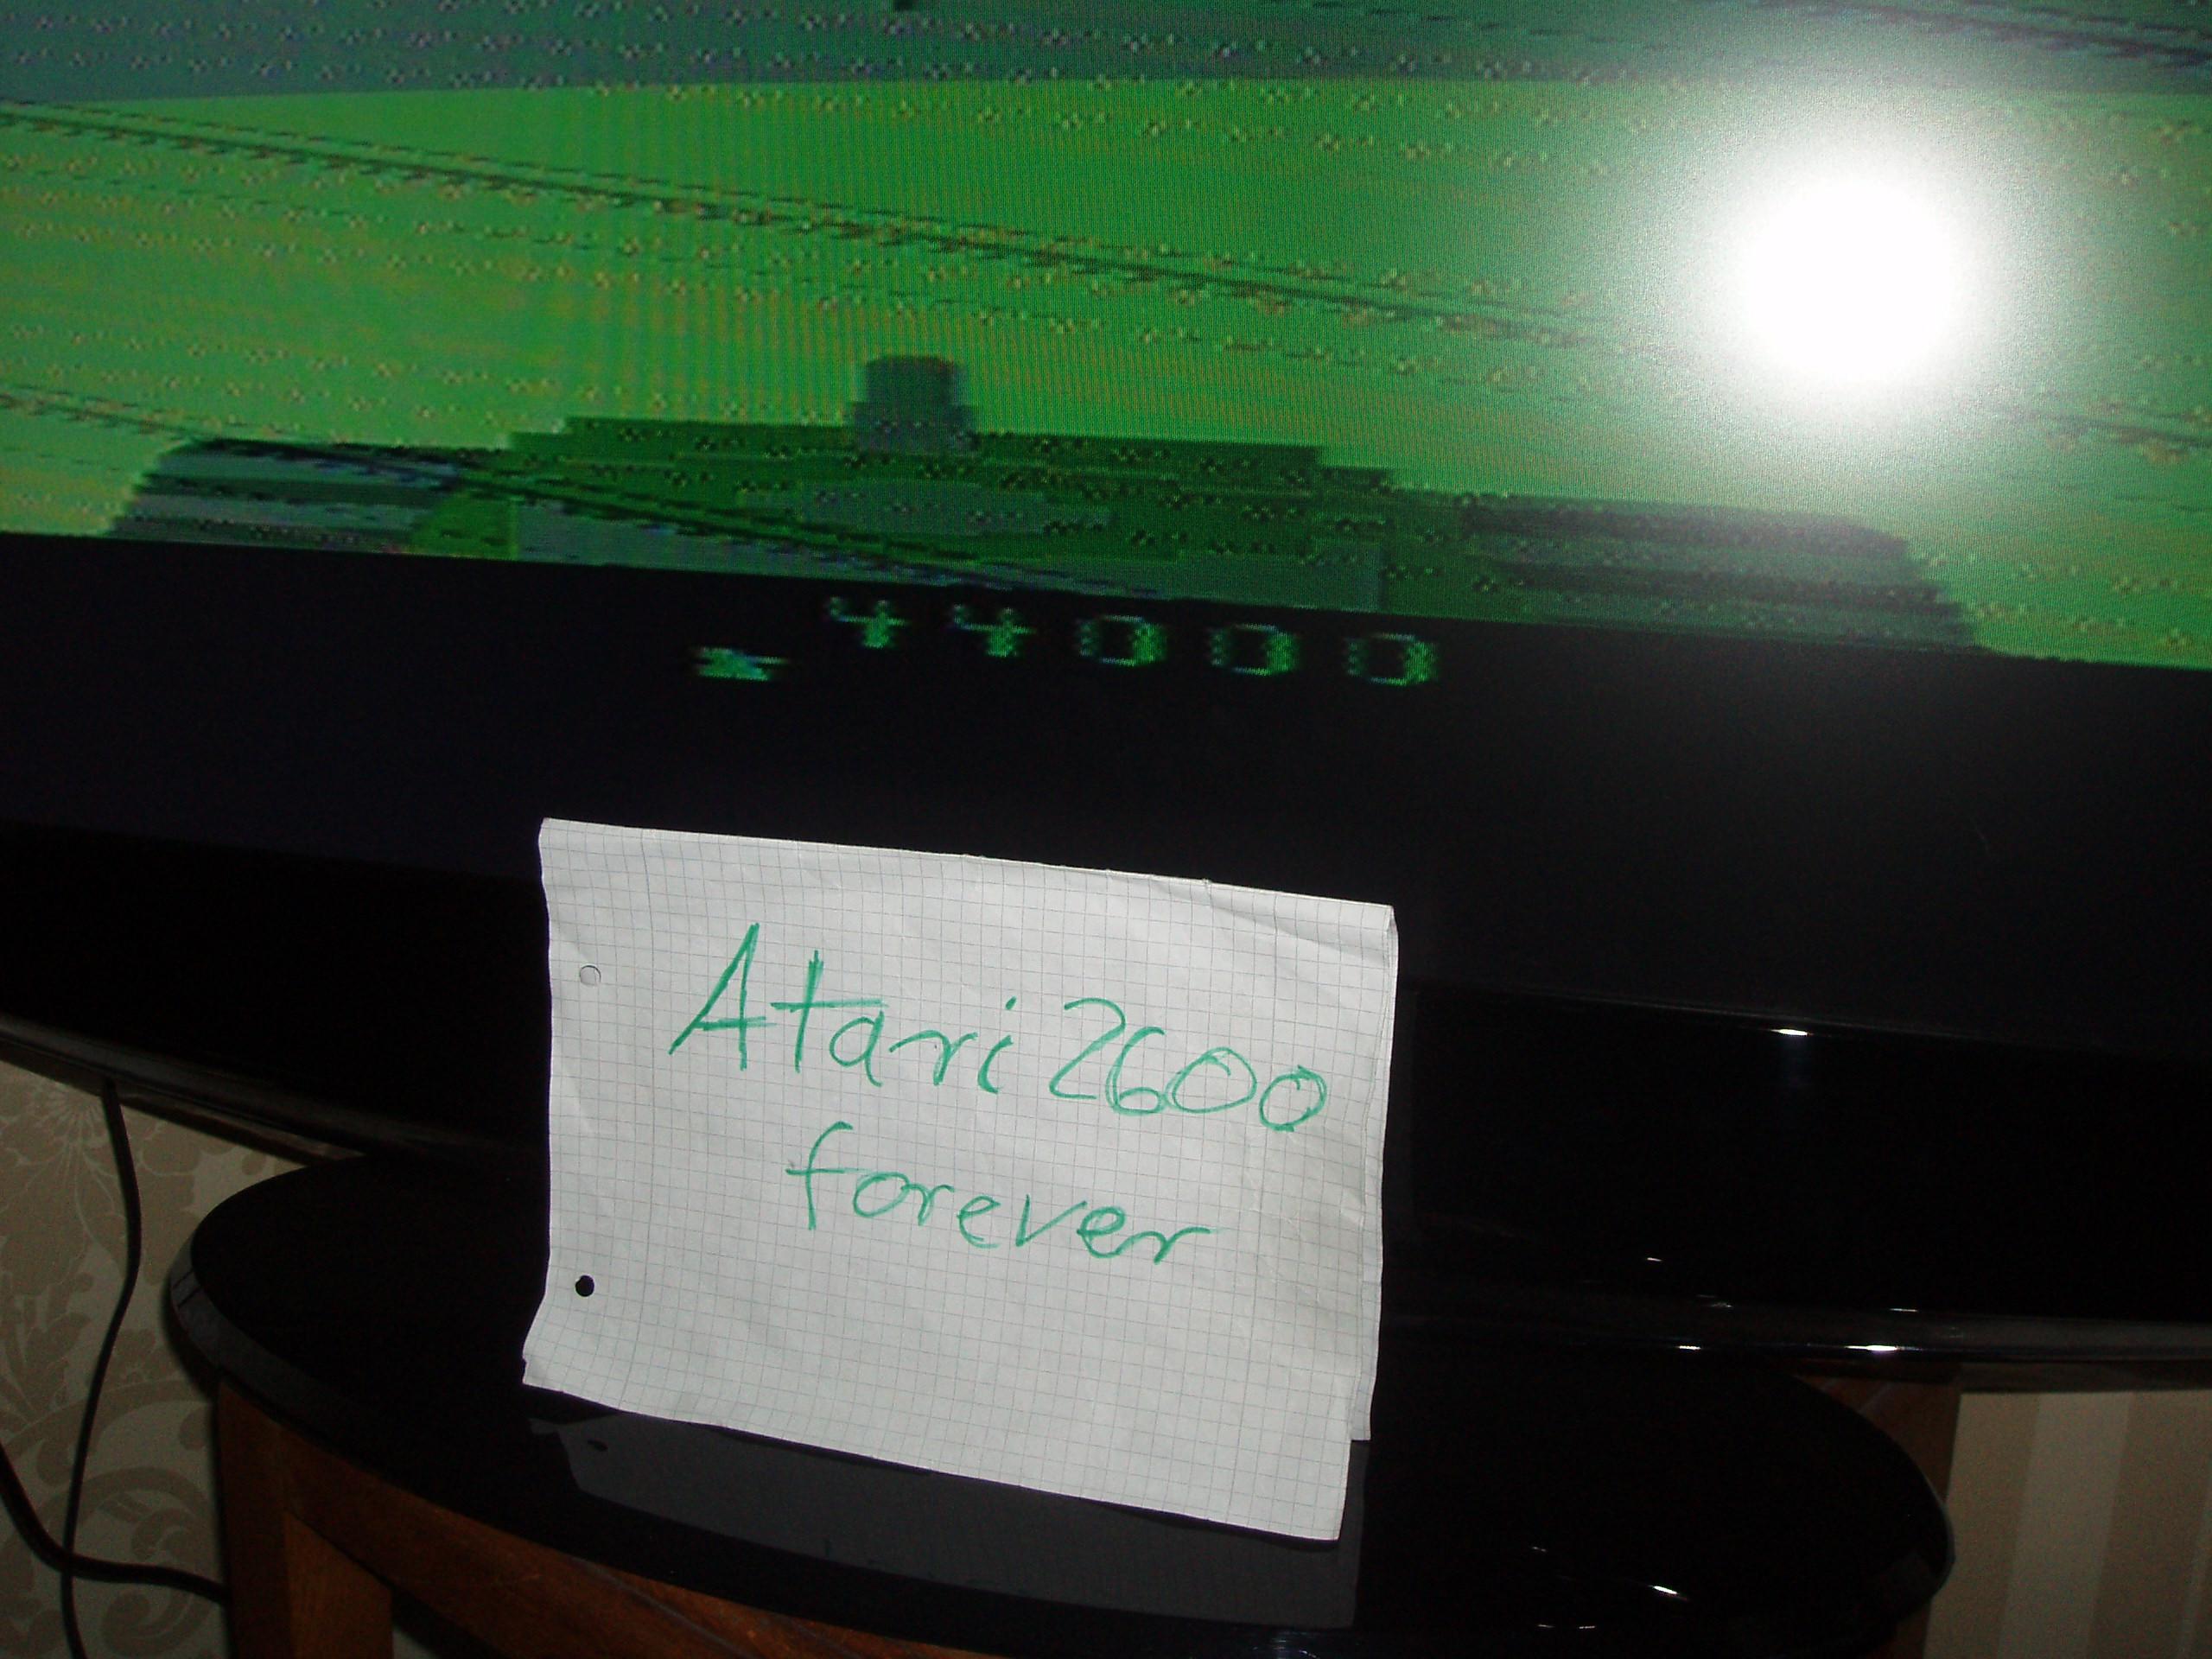 atari2600forever: Battlezone (Atari 2600) 44,000 points on 2017-05-09 05:55:25